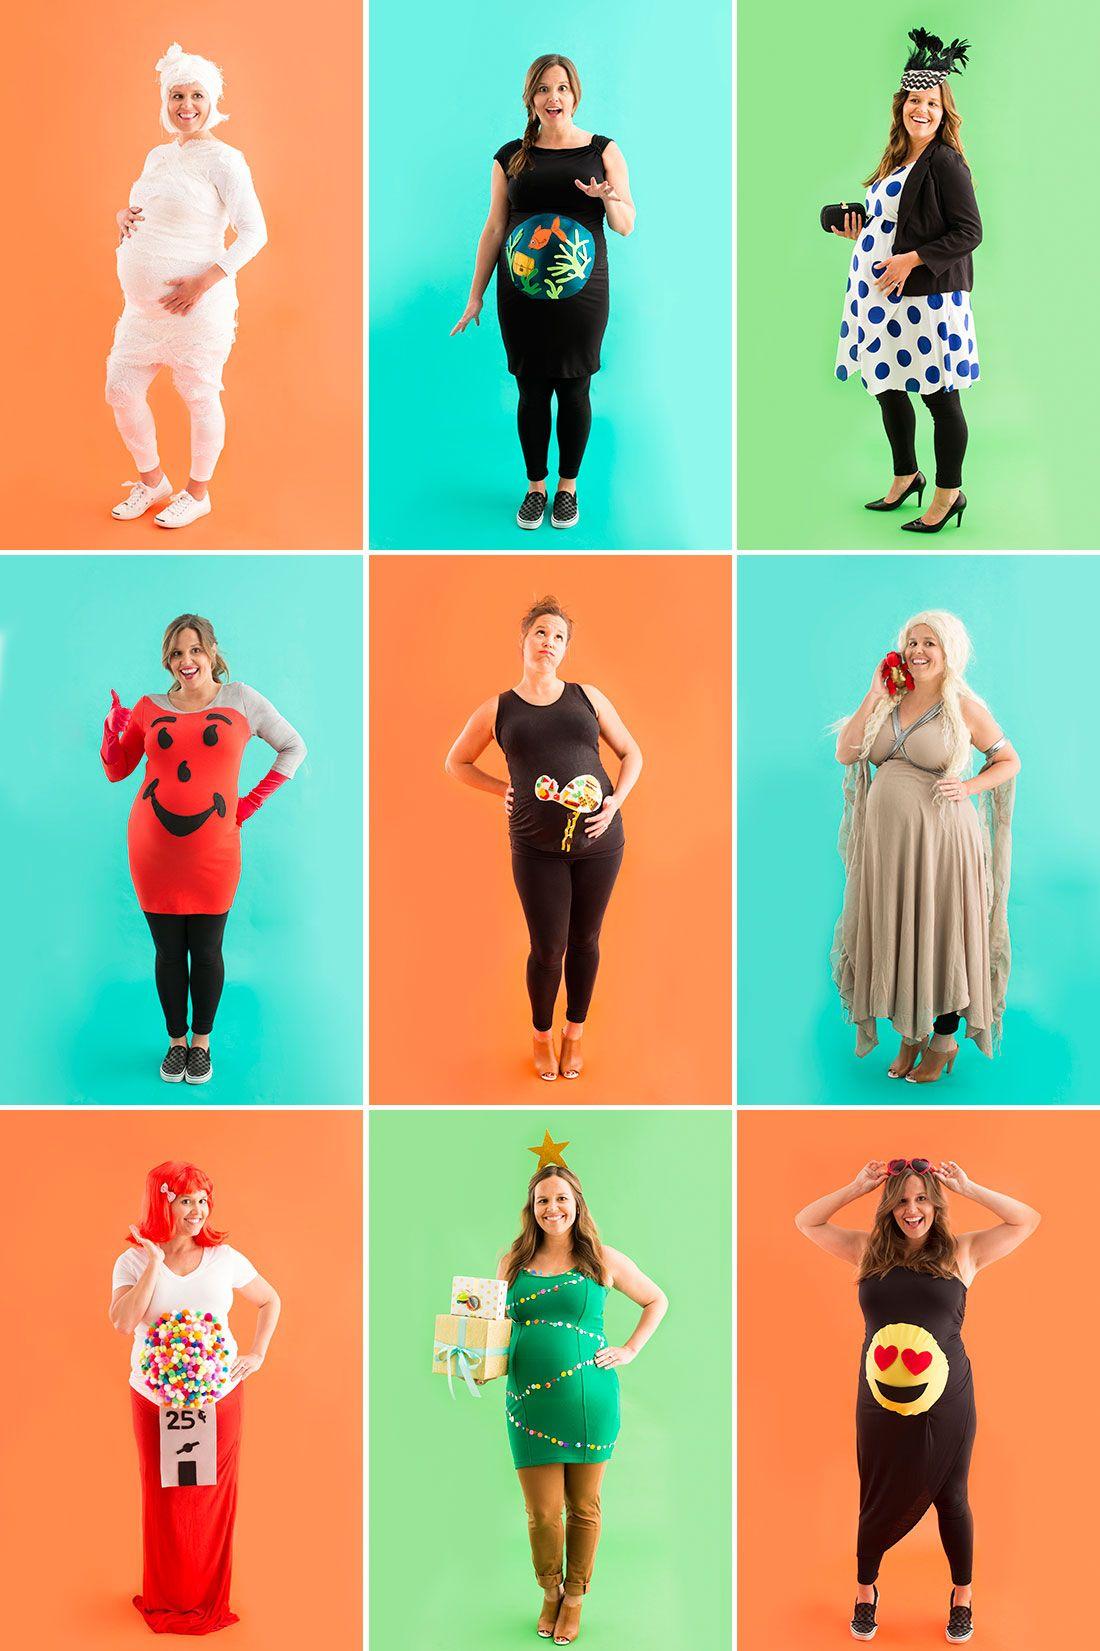 10 diy maternity halloween costume ideas for pregnant women via brit co - Maternity Halloween Costumes Pregnancy